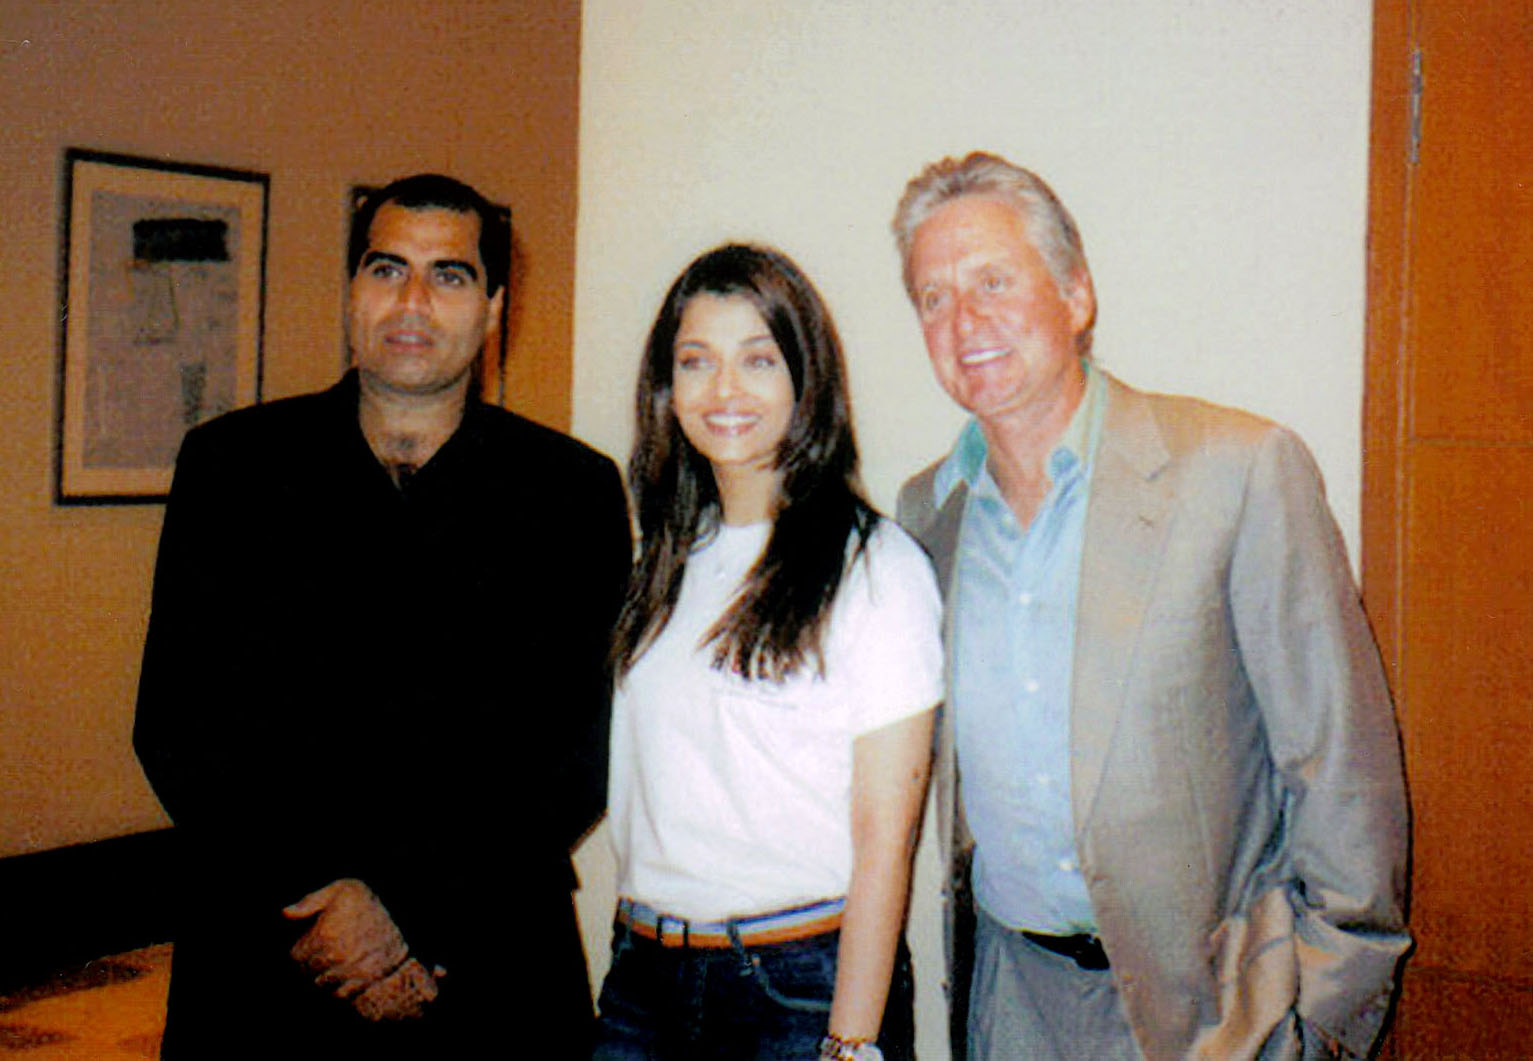 with Aishwarya Rai and Michael Douglas